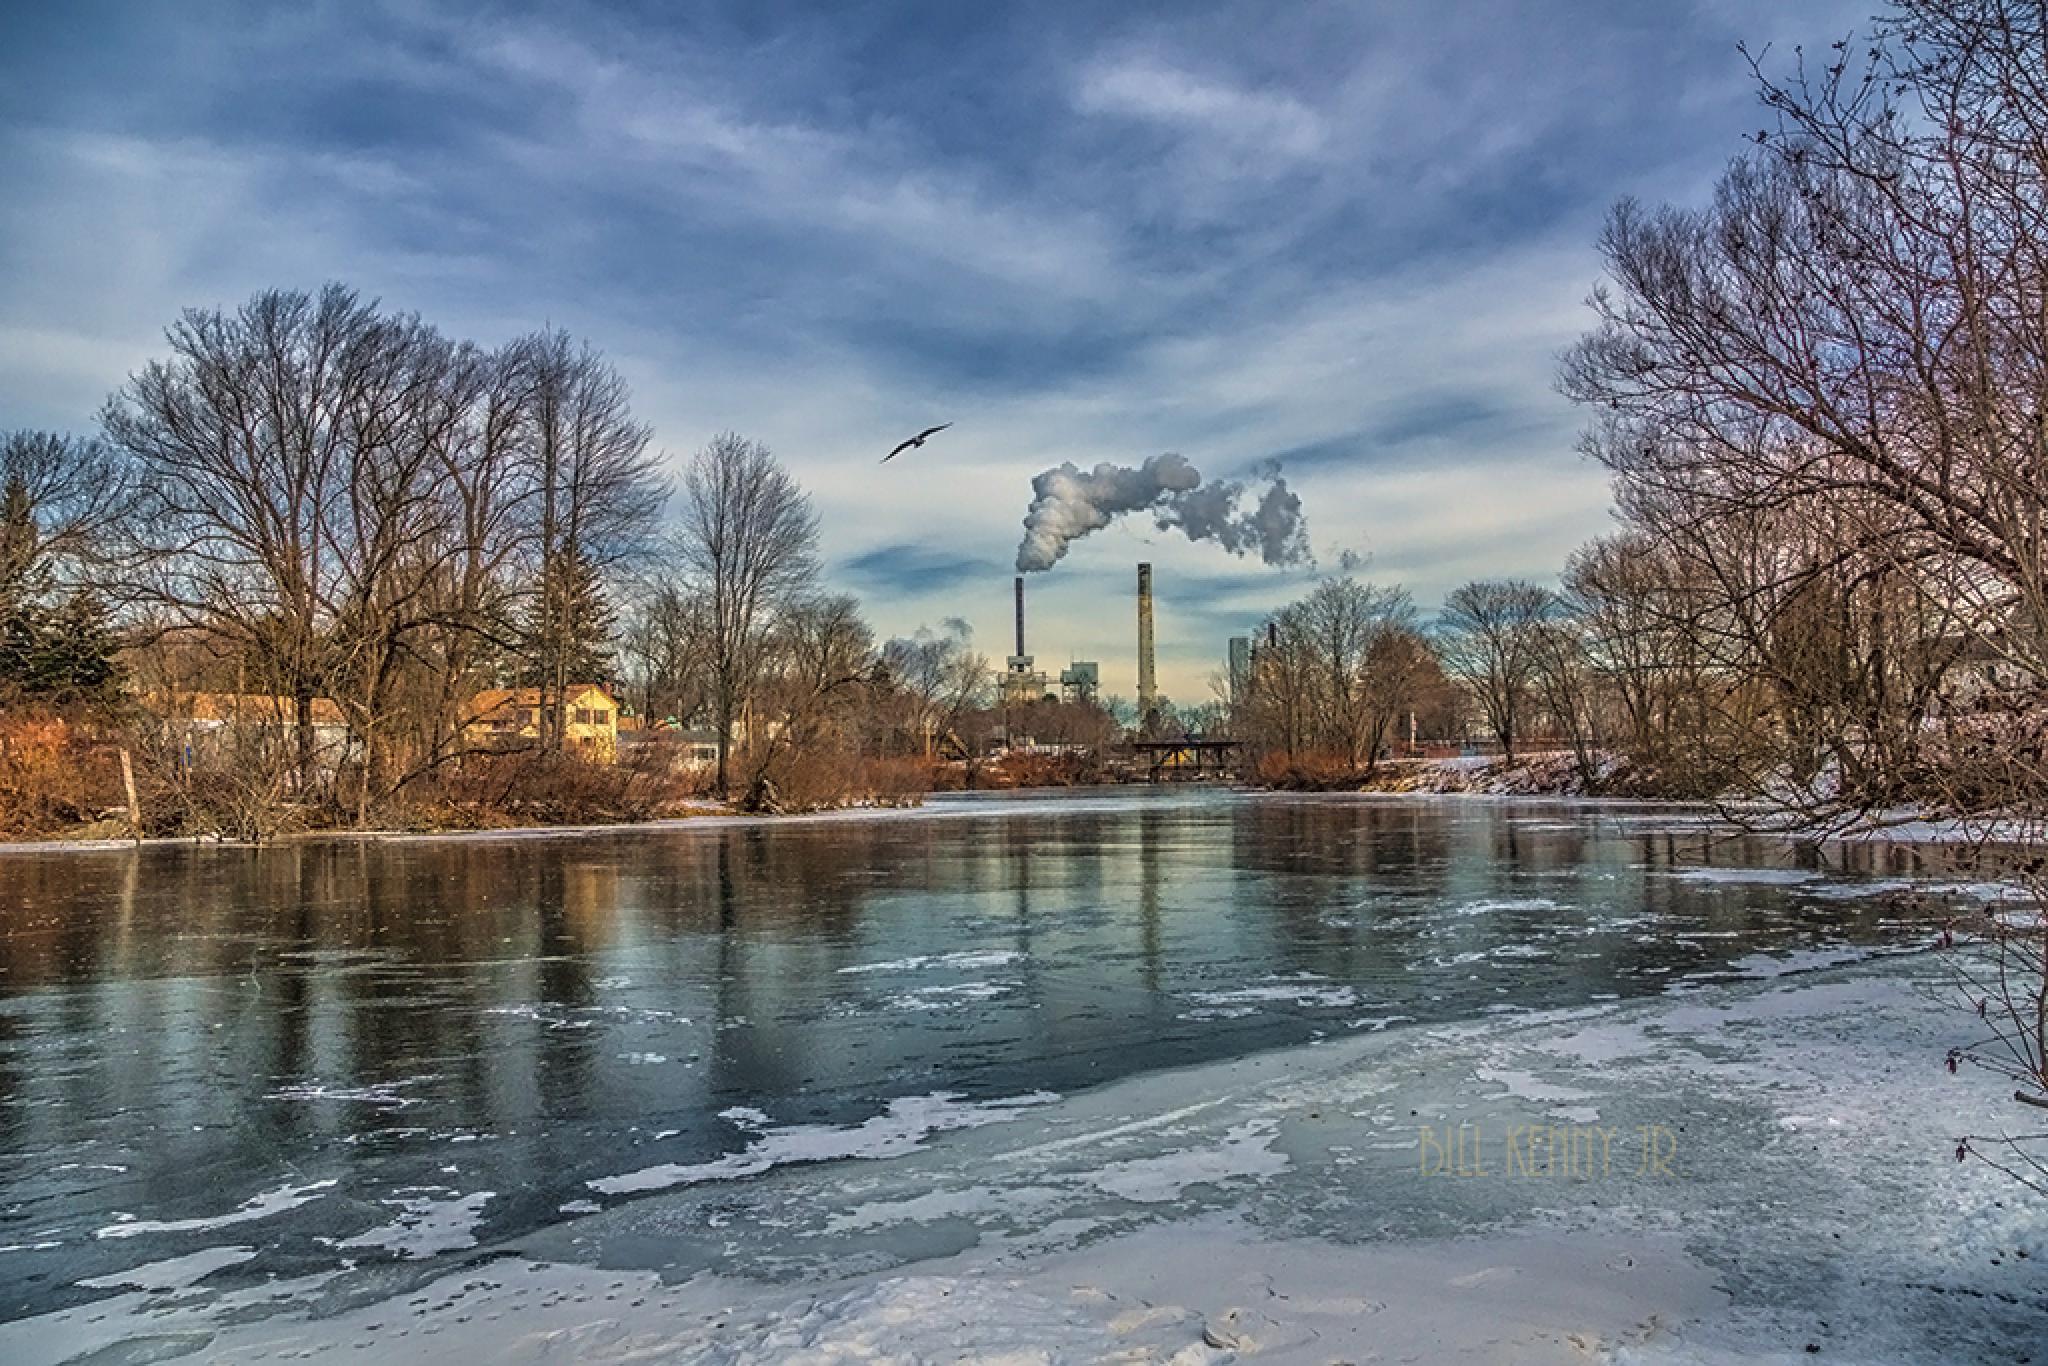 Riverbank Park by BilloKenny